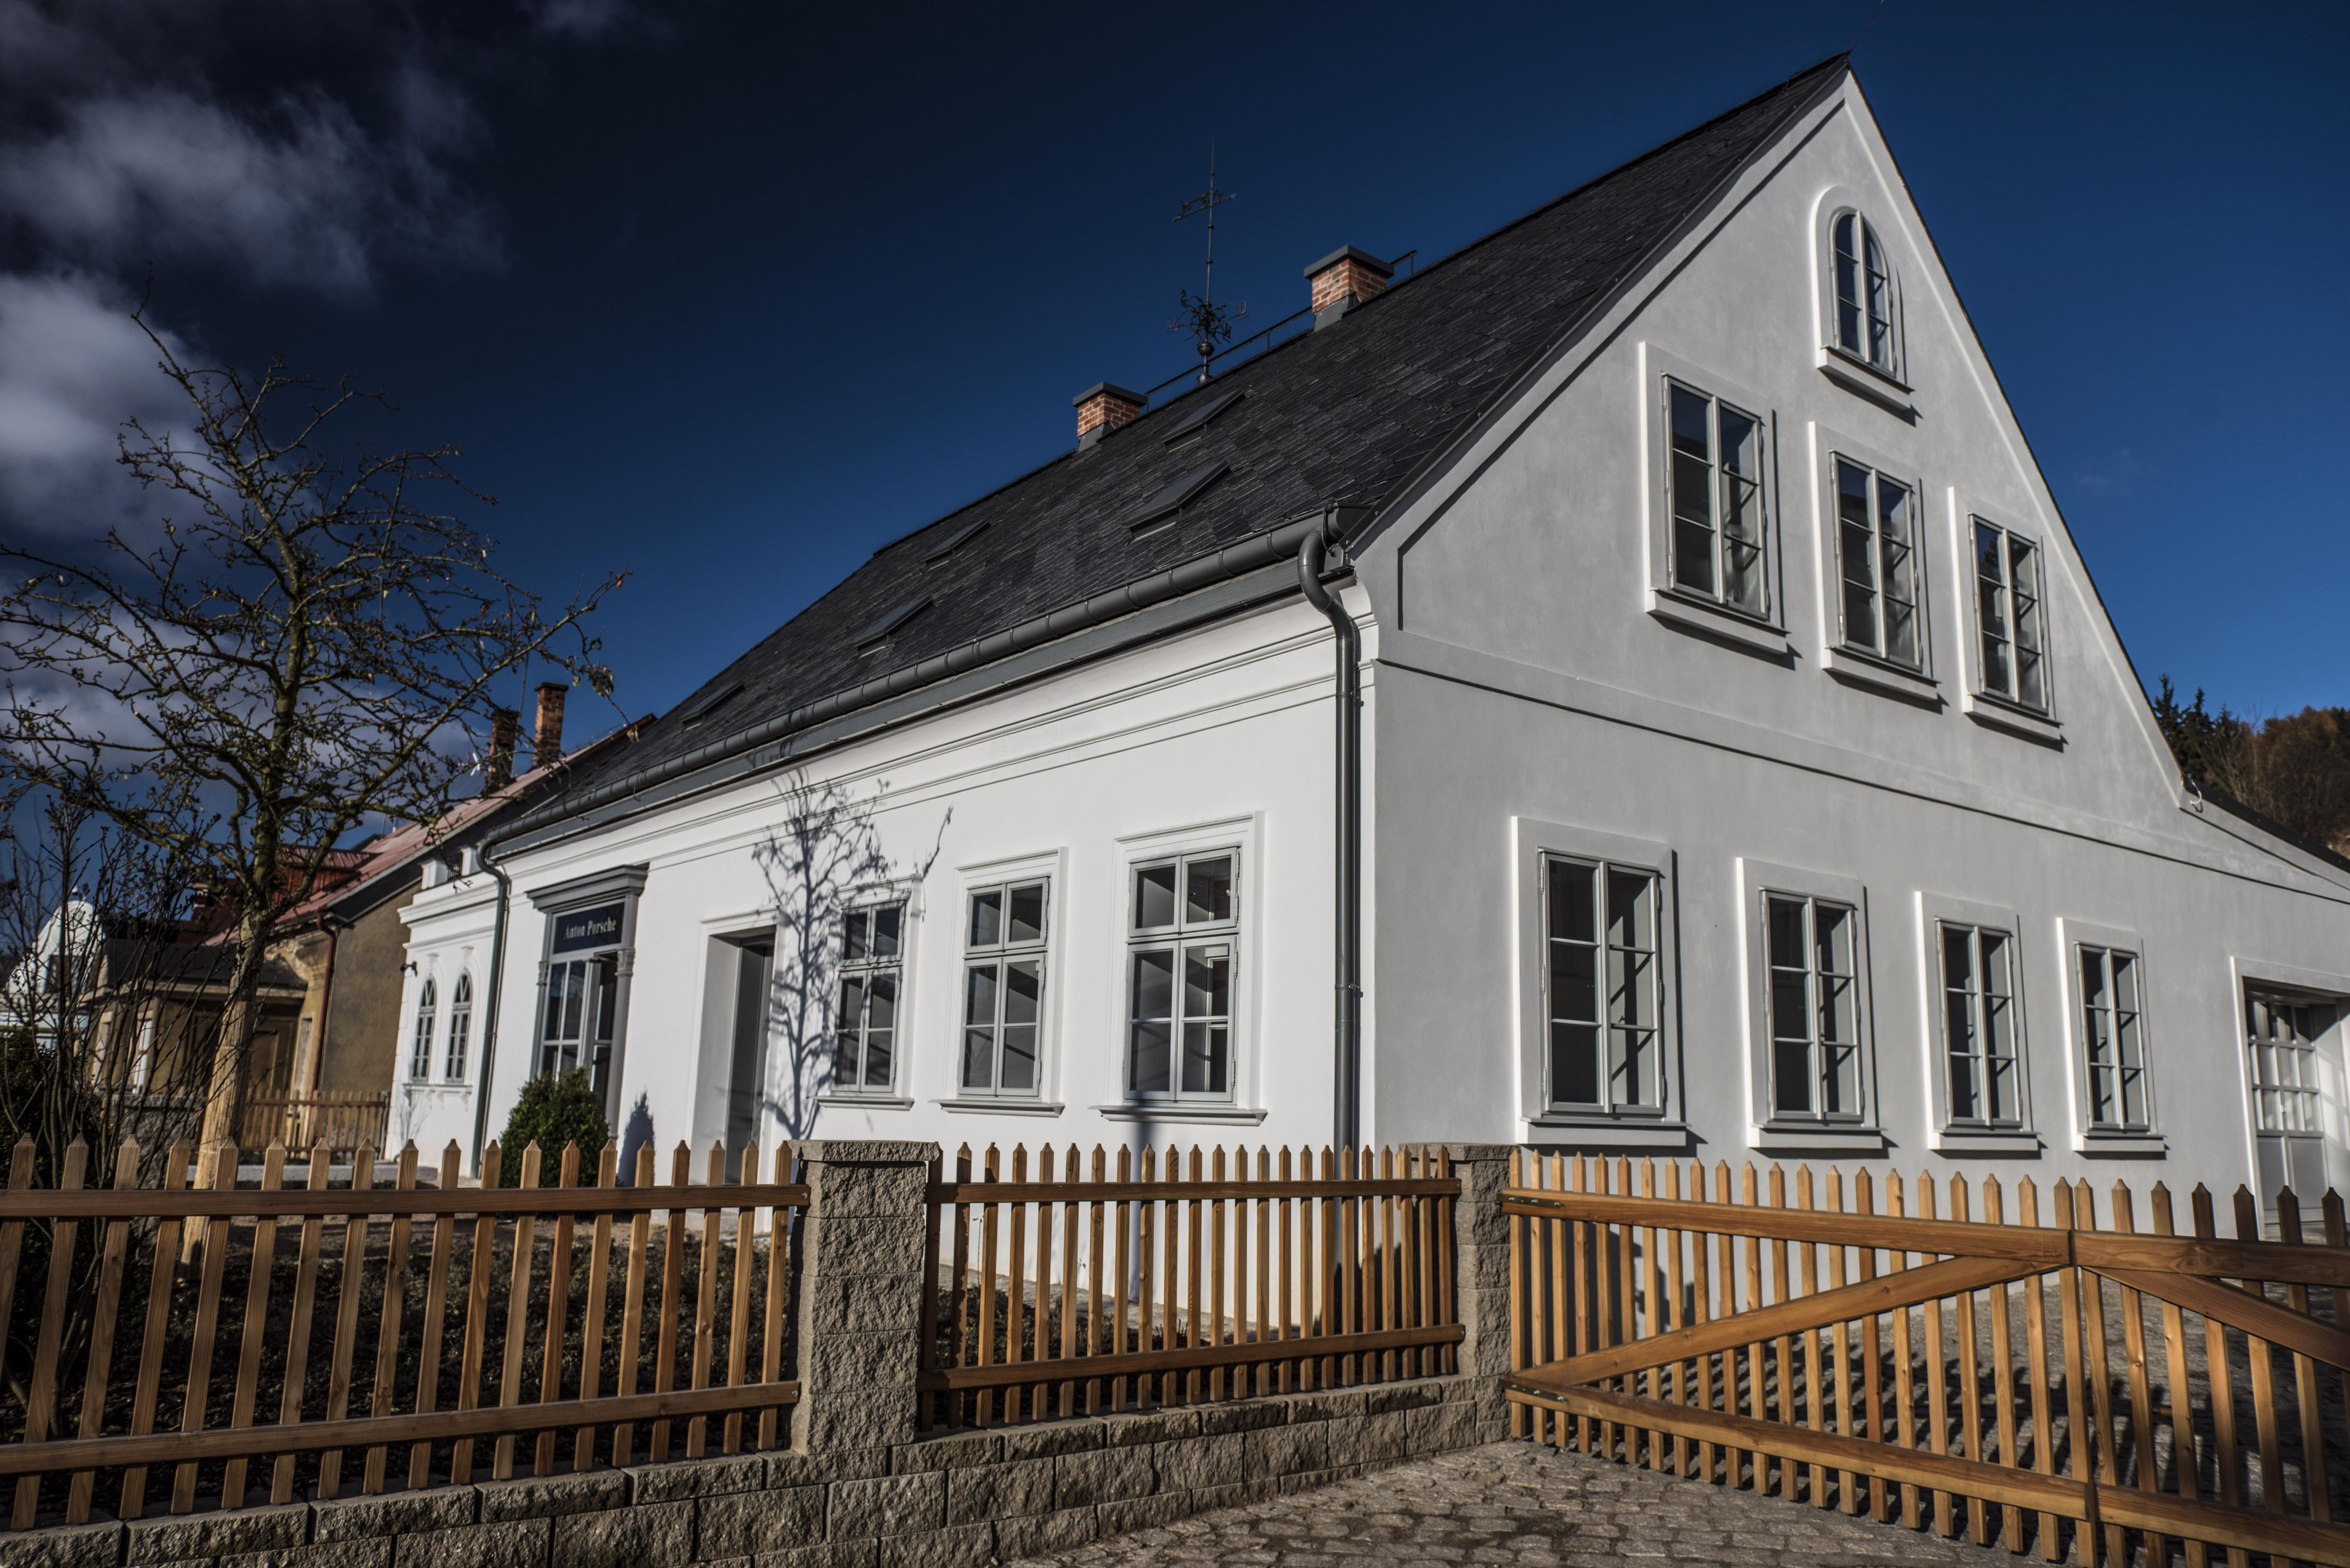 SKODA Museum and Ferdinand Porsche Birth House reopen - Image 1